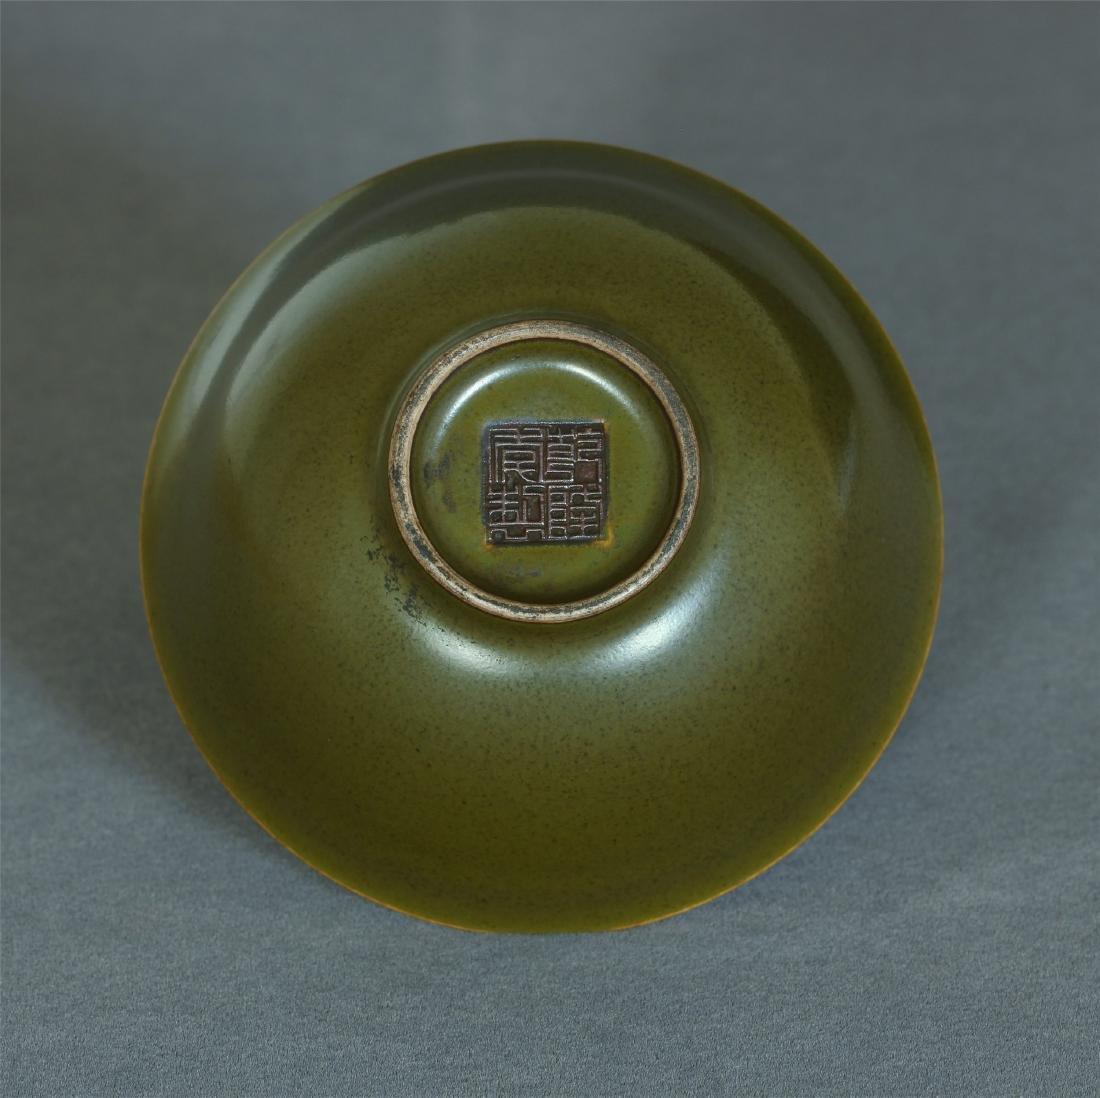 Tea glaze porcelain small bowl of Qing Dynasty QianLong - 5